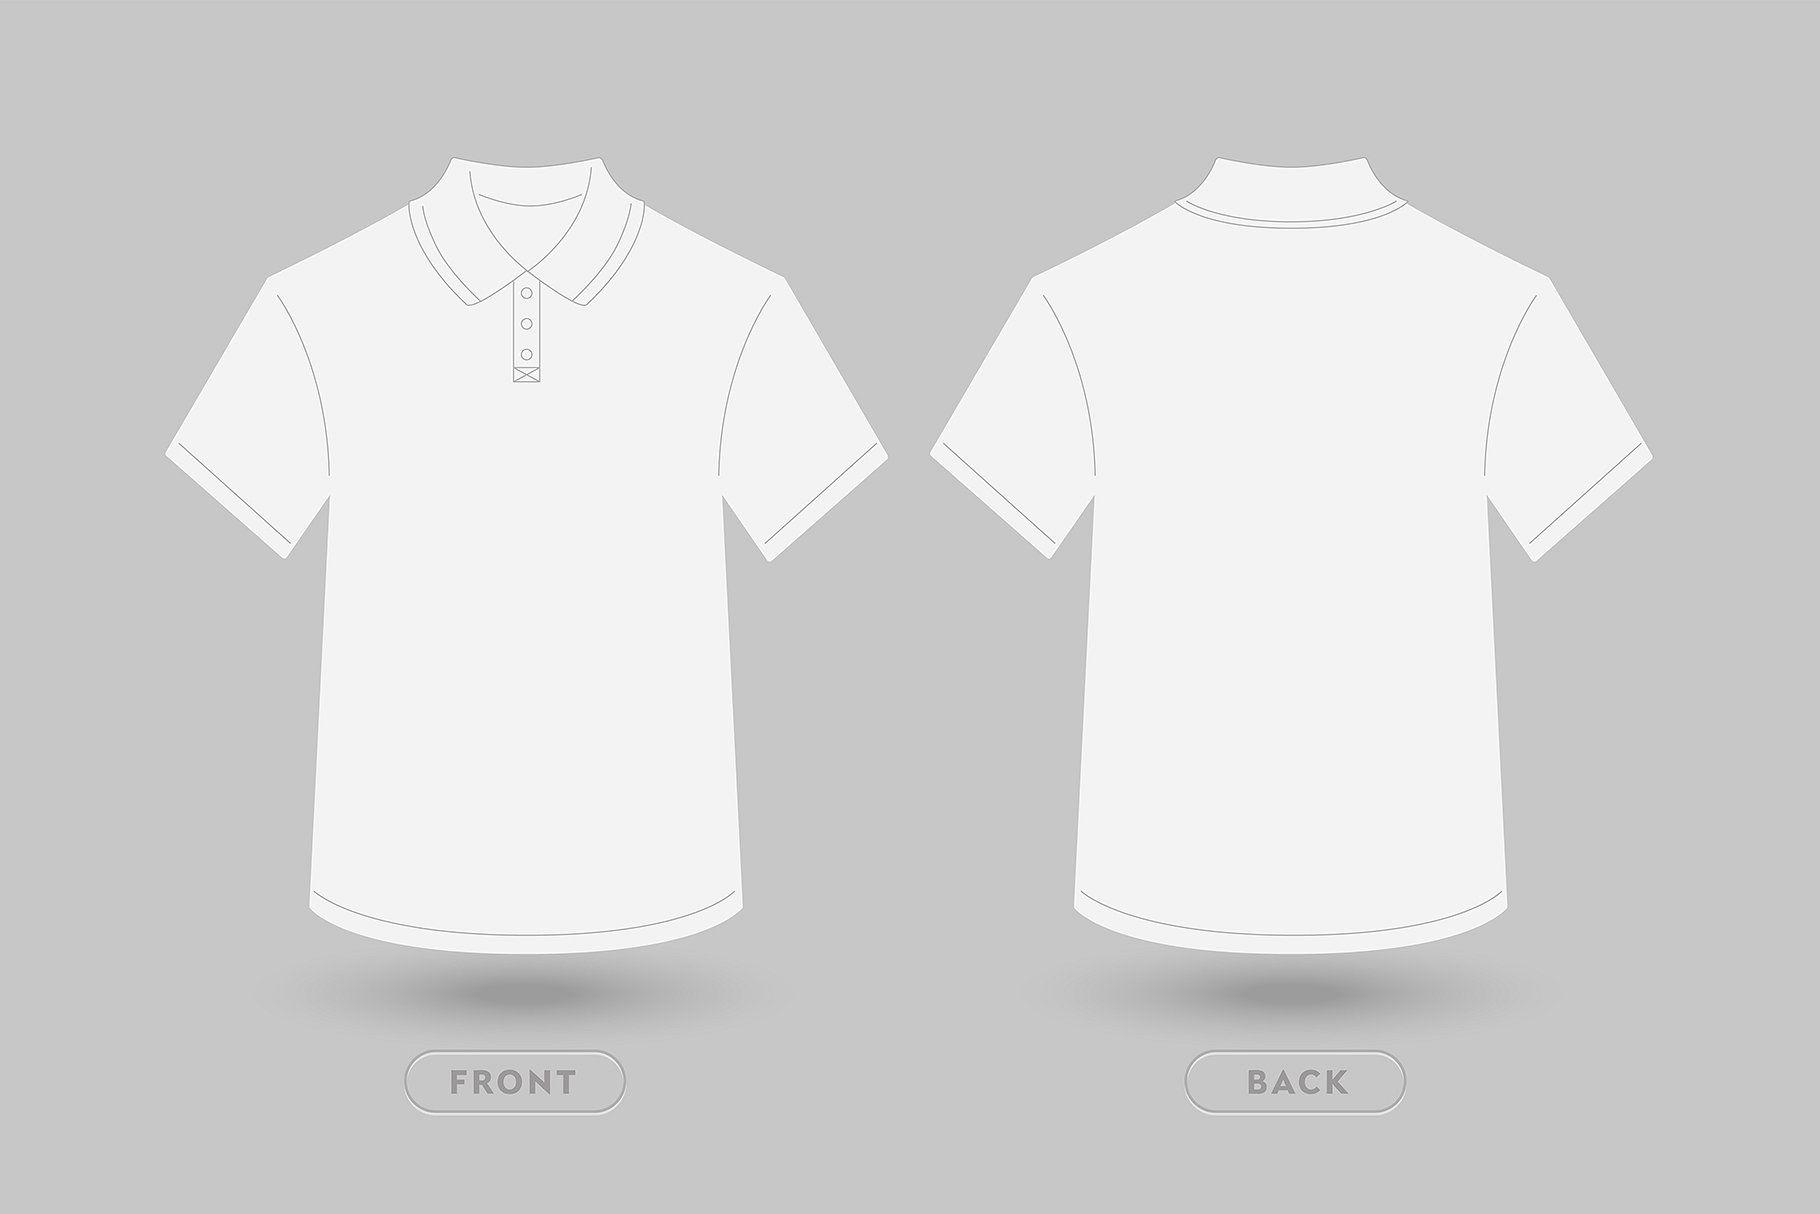 Polo T Shirt Vector Mockup Vector Illustration Front